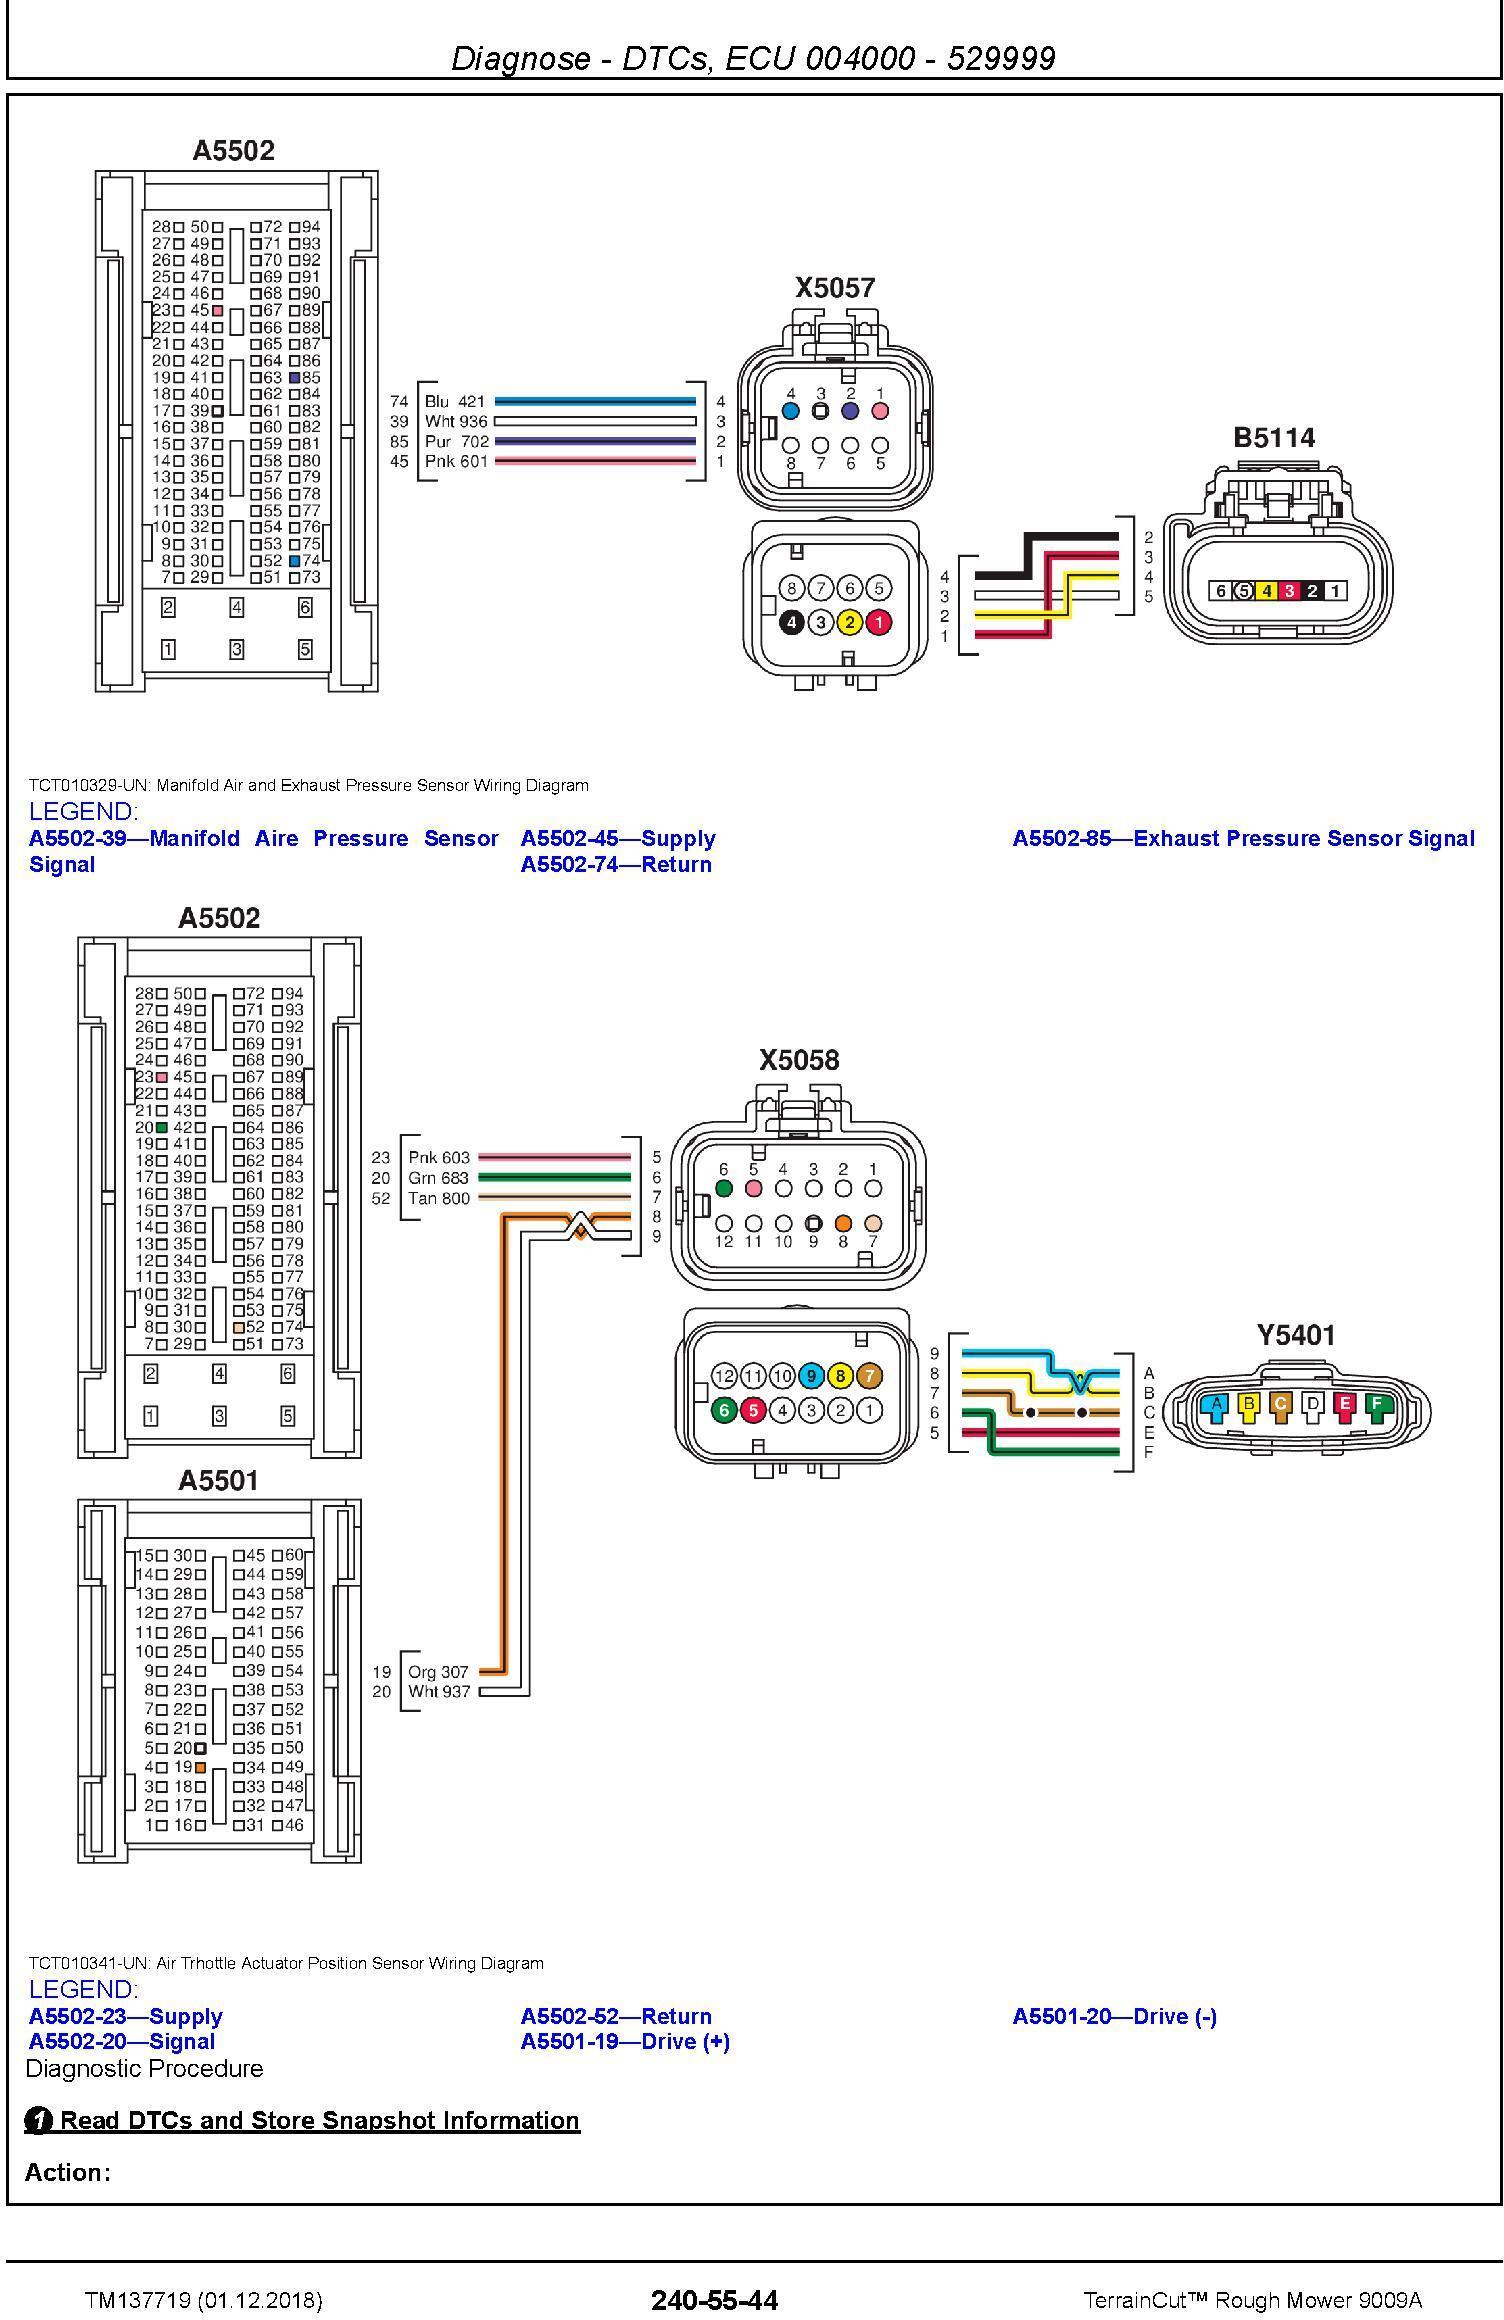 John Deere TerrainCut Rough Mower 9009A Technical Service Manual (TM137719) - 1